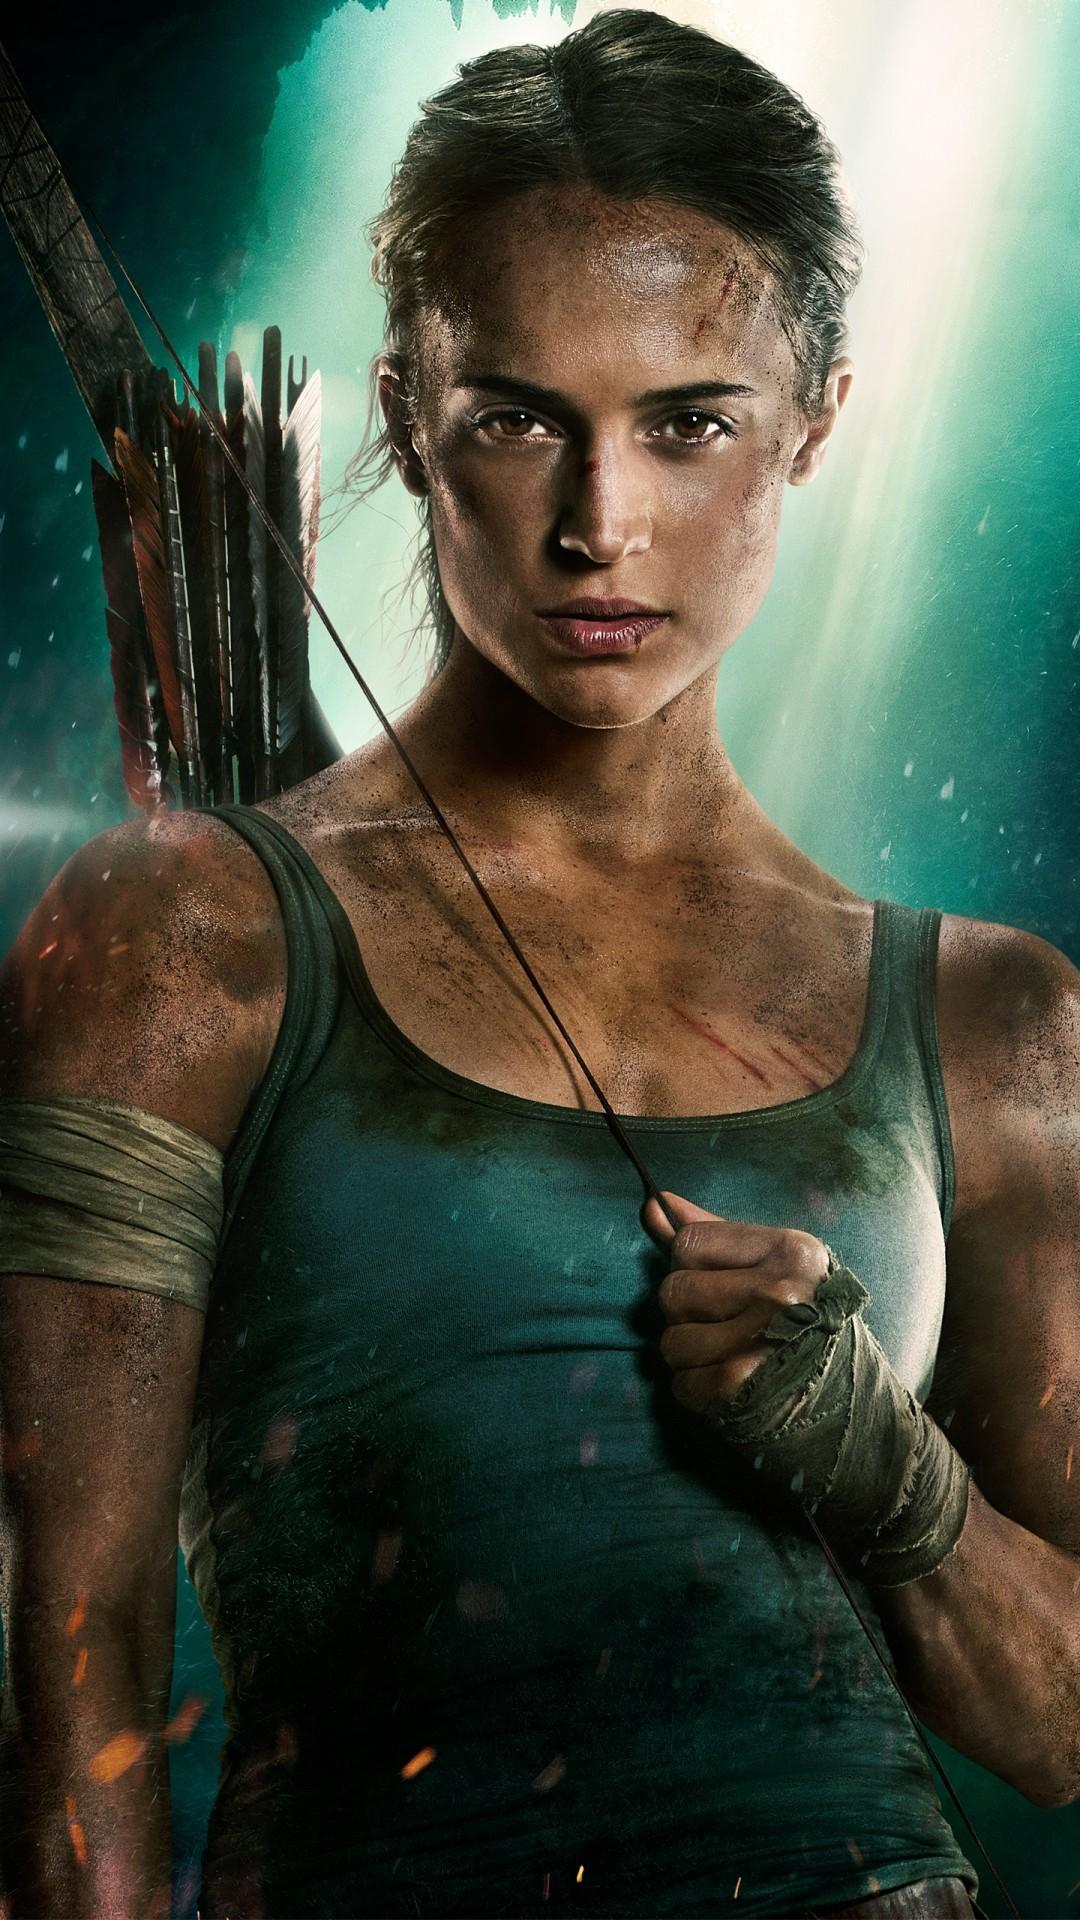 Free Lara Croft Tomb Raider Alicia Vikander phone wallpaper by cmooremusic